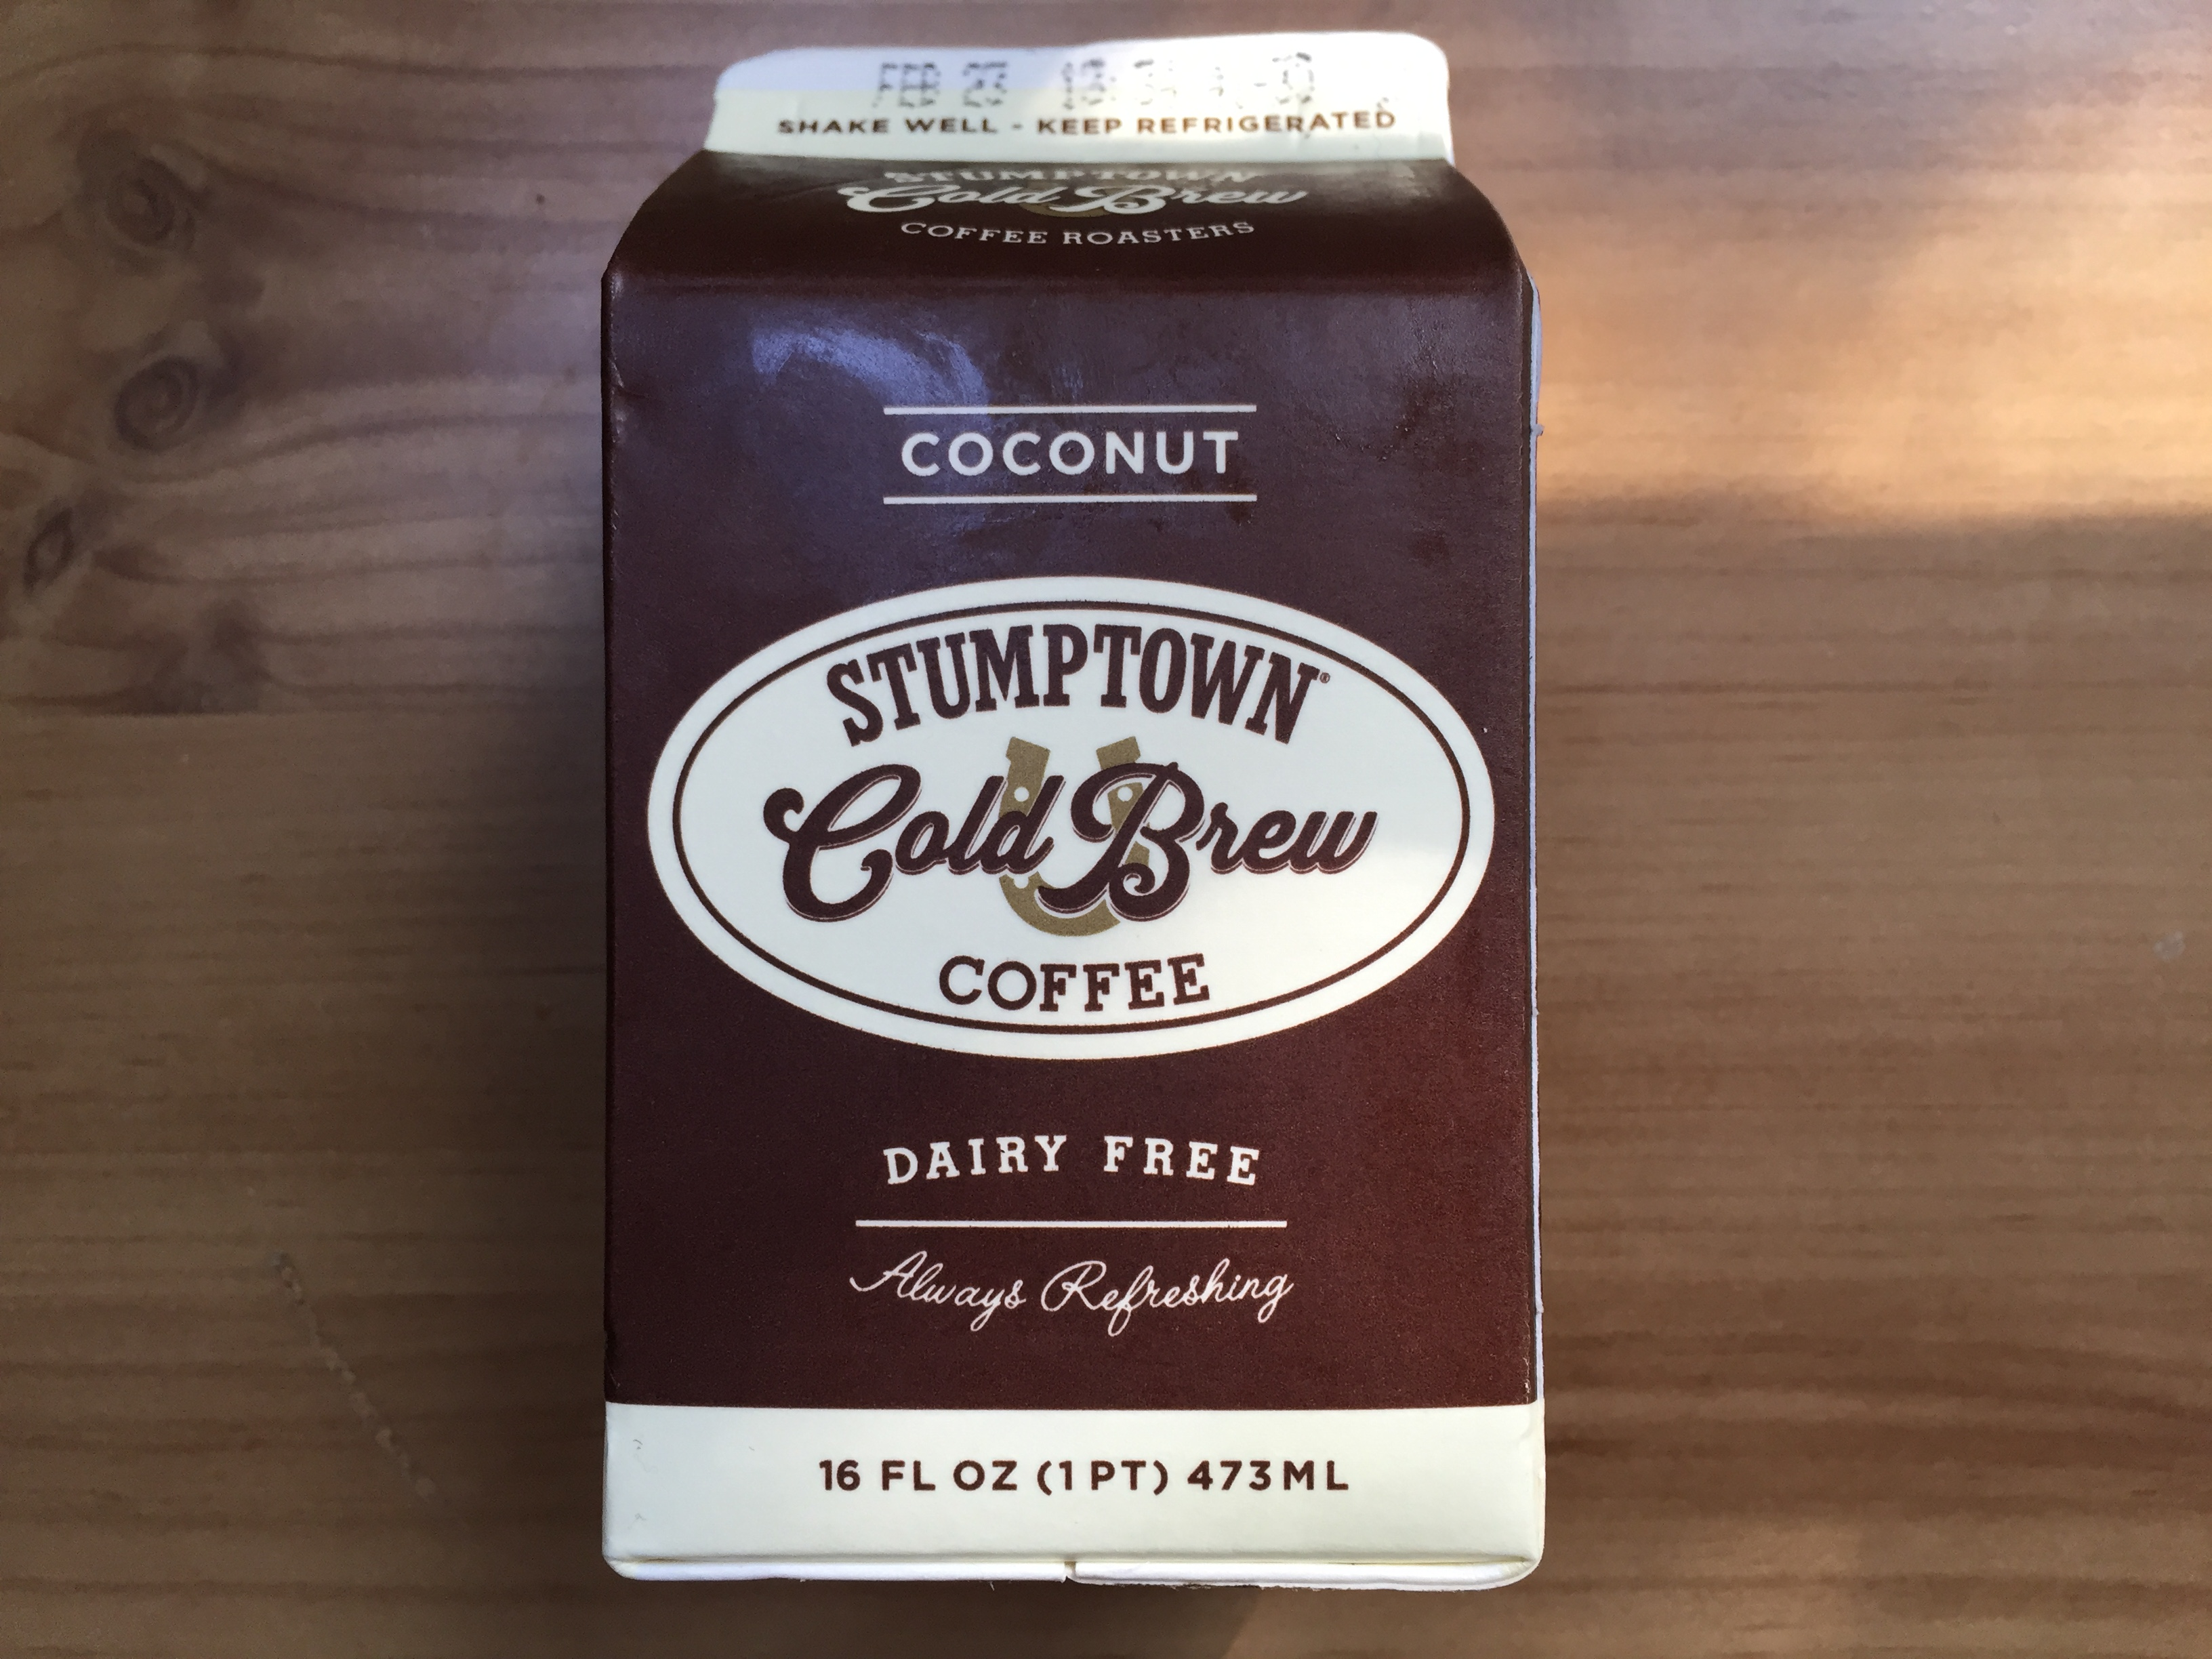 Stumptown Coconut Cold Brew